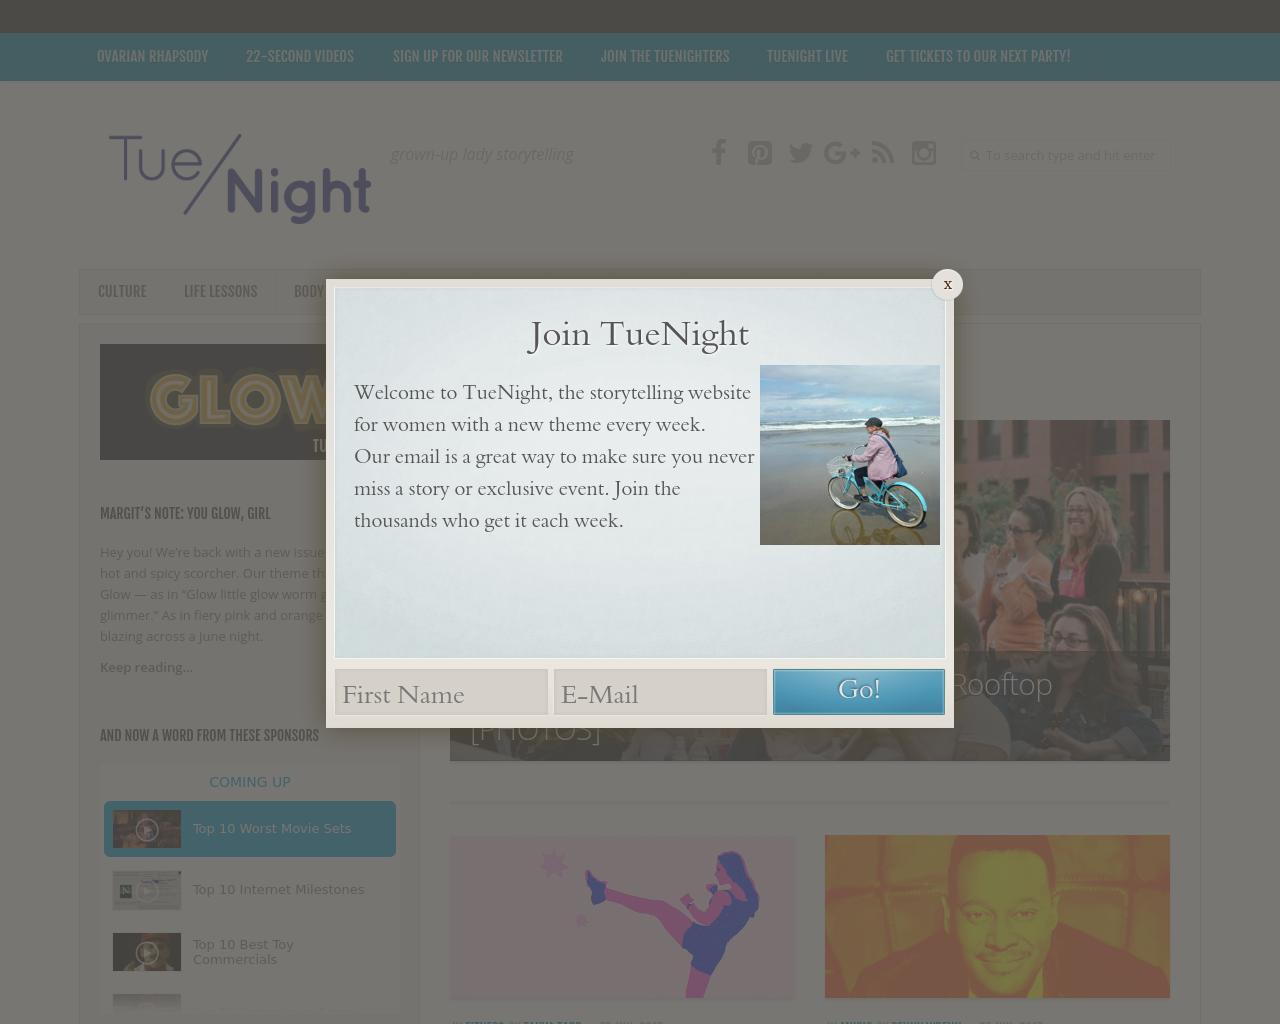 TueNight-Advertising-Reviews-Pricing